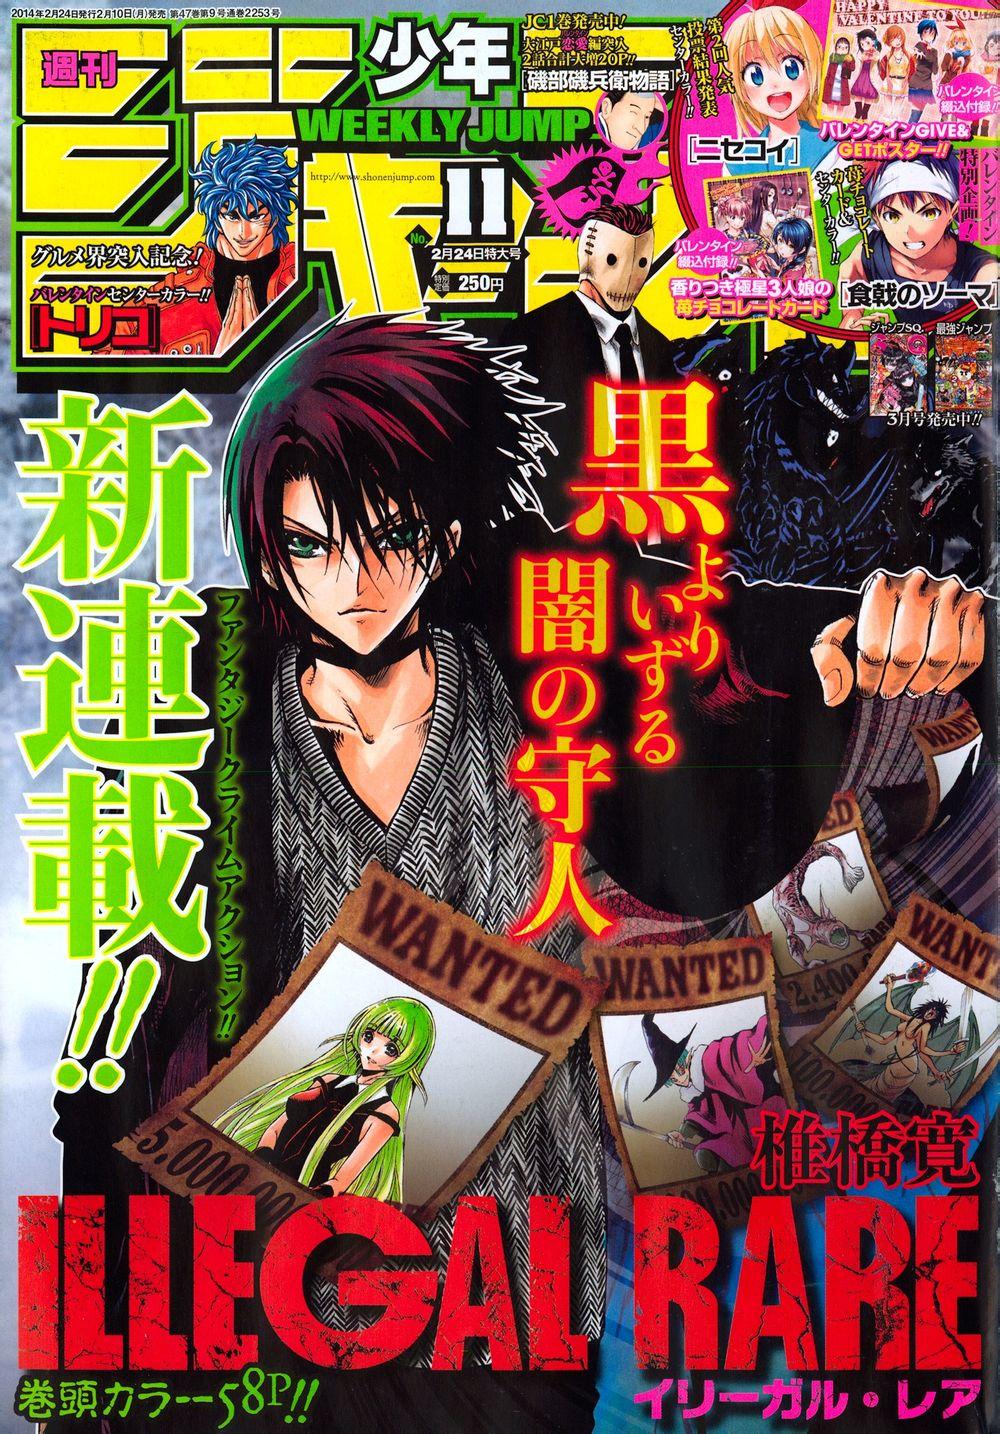 Weekly Shonen Jump 2014 #11